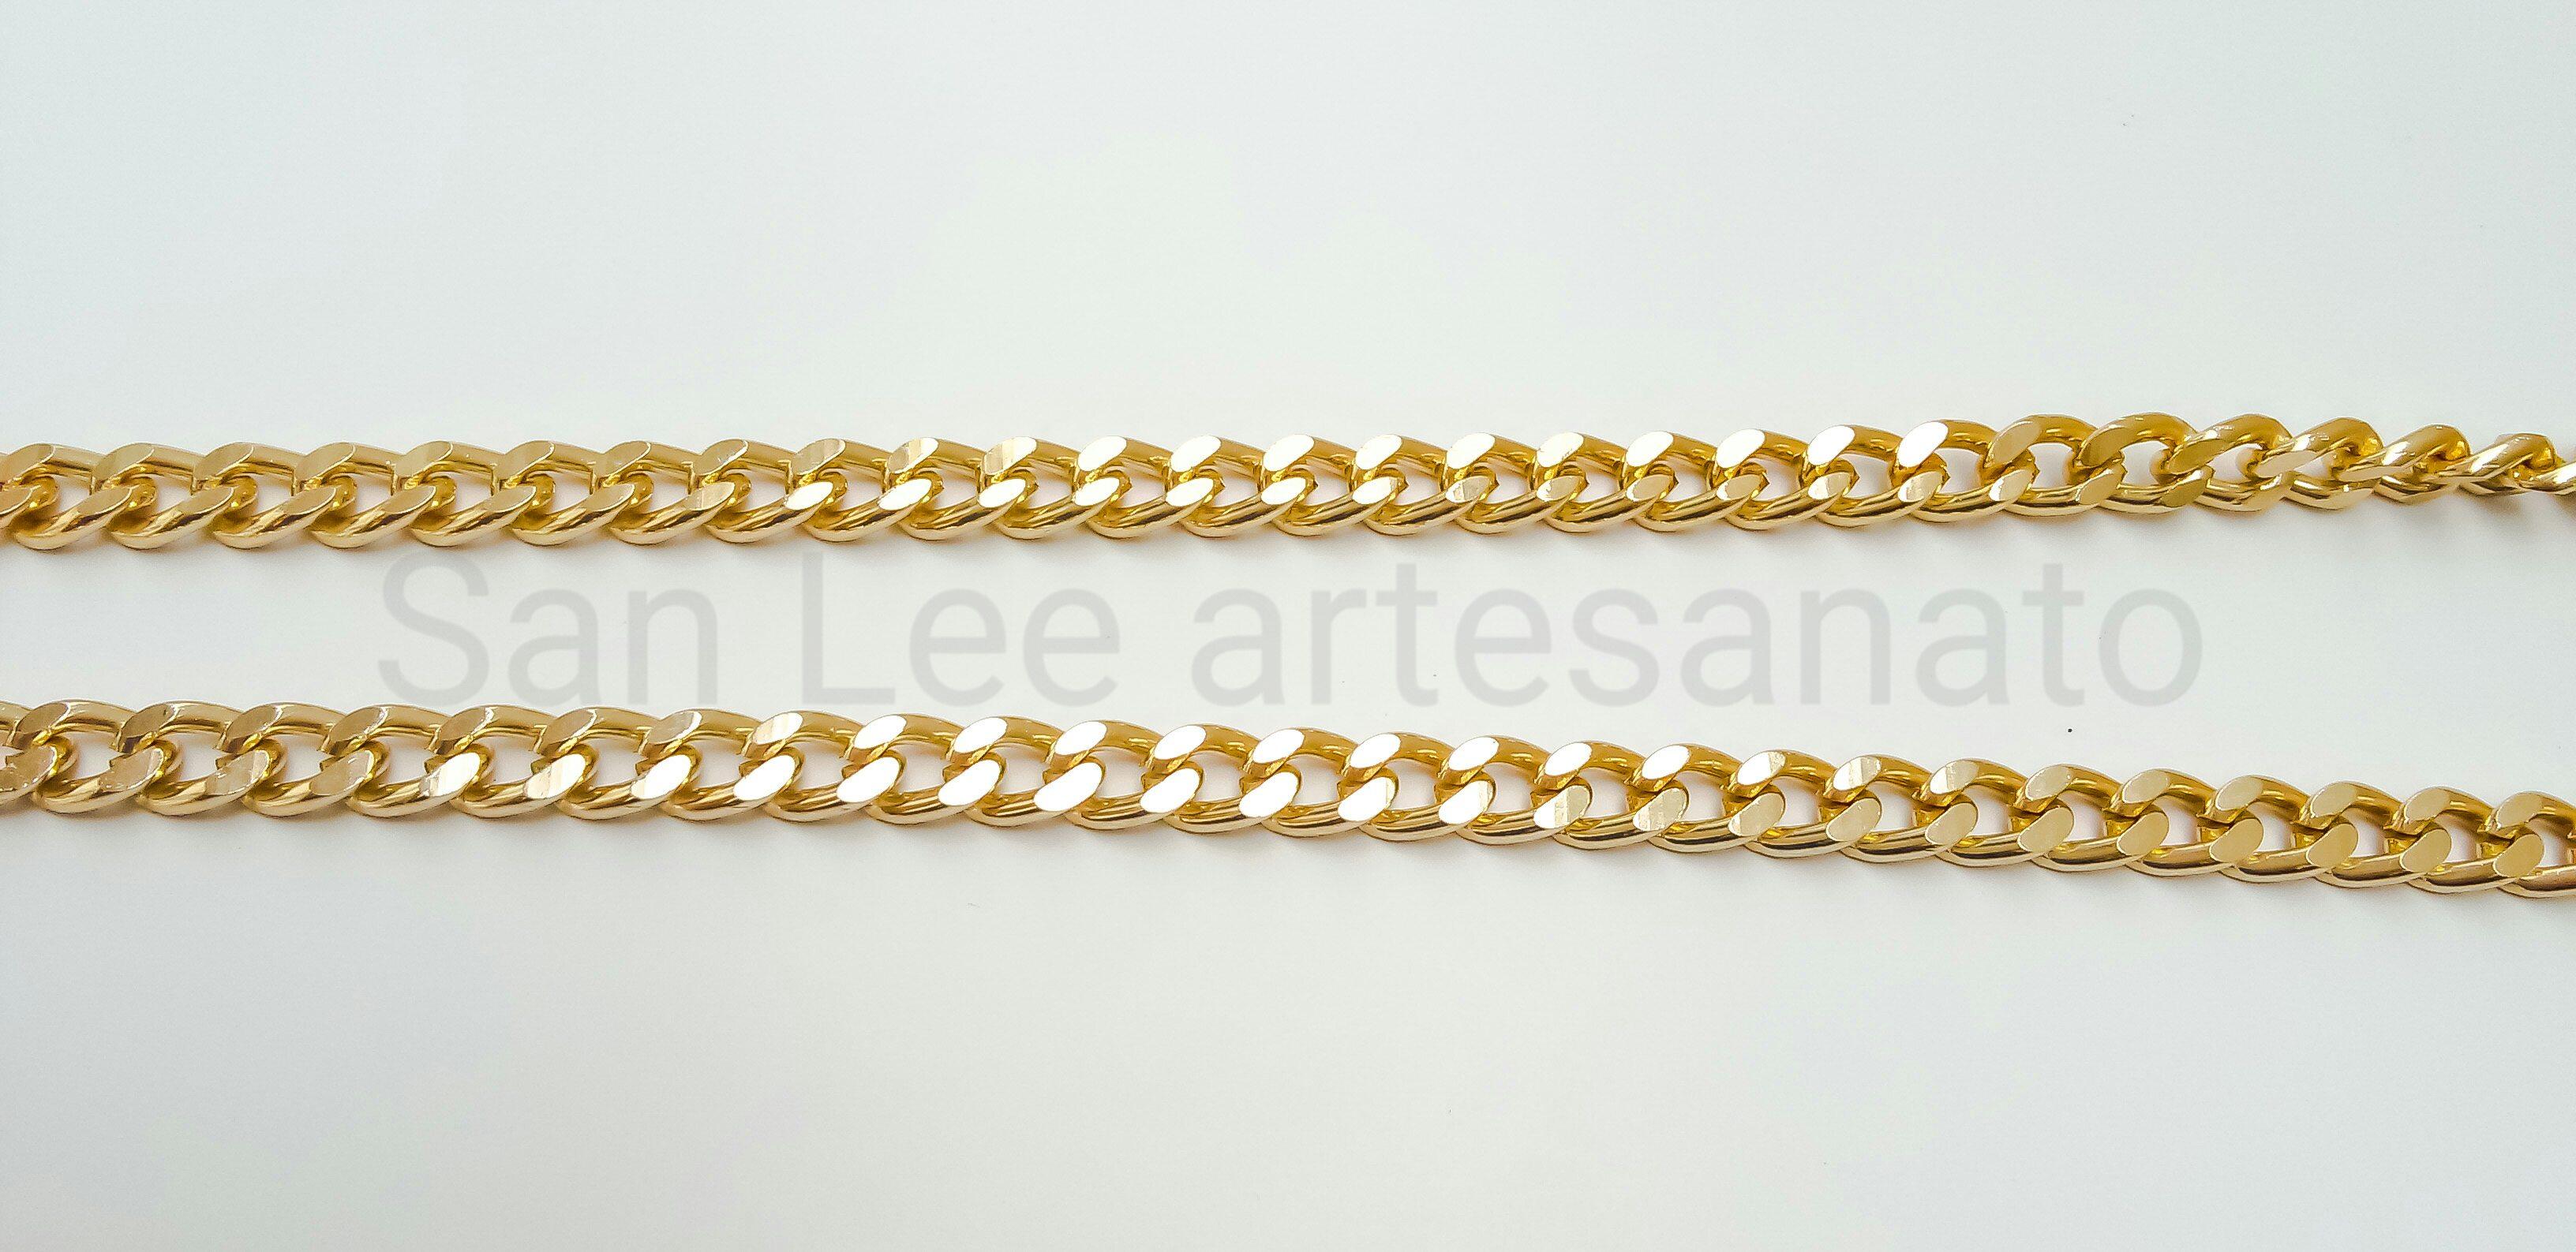 4166849a9021 segura óculos de corrente dourada 5mm no Elo7 | San Lee artesanato (BA2797)